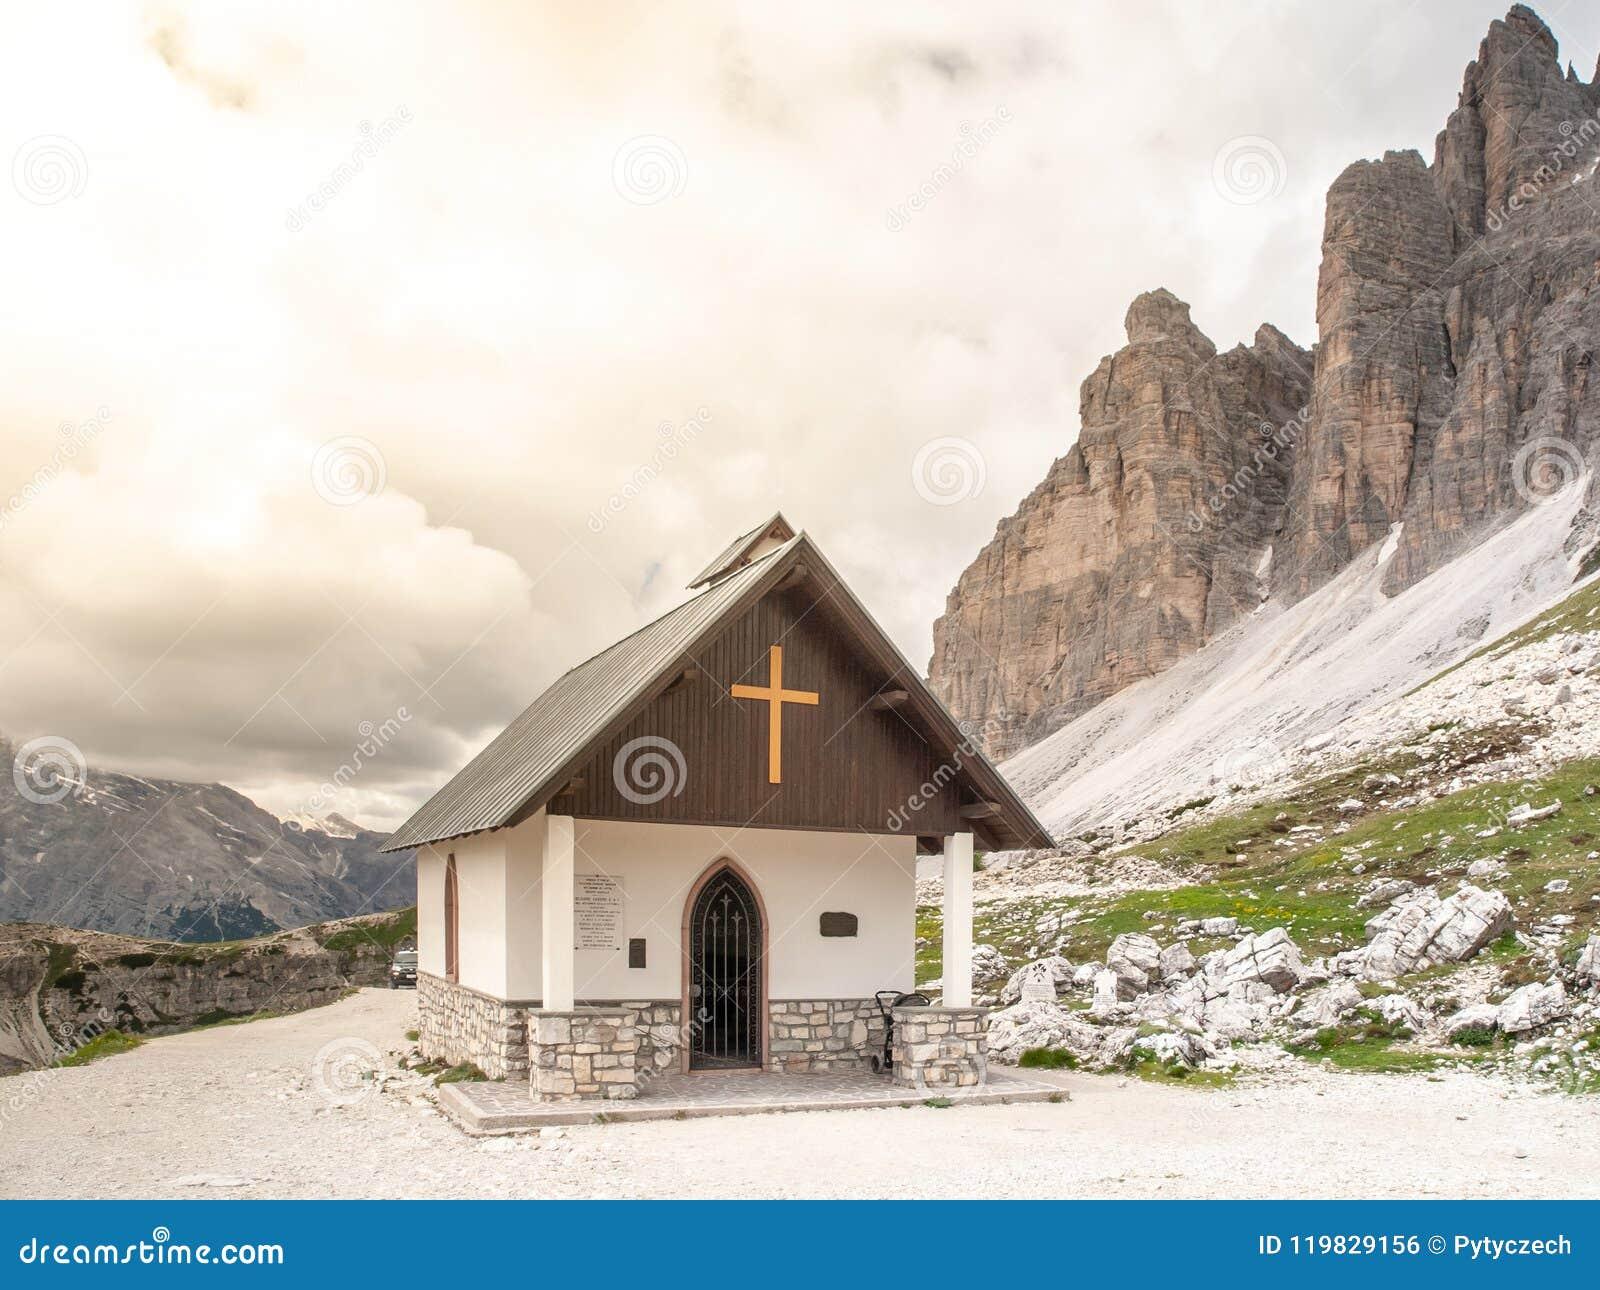 小山教堂,在Tre Cime di Lavaredo的Cappella degli Alpini,白云岩,意大利